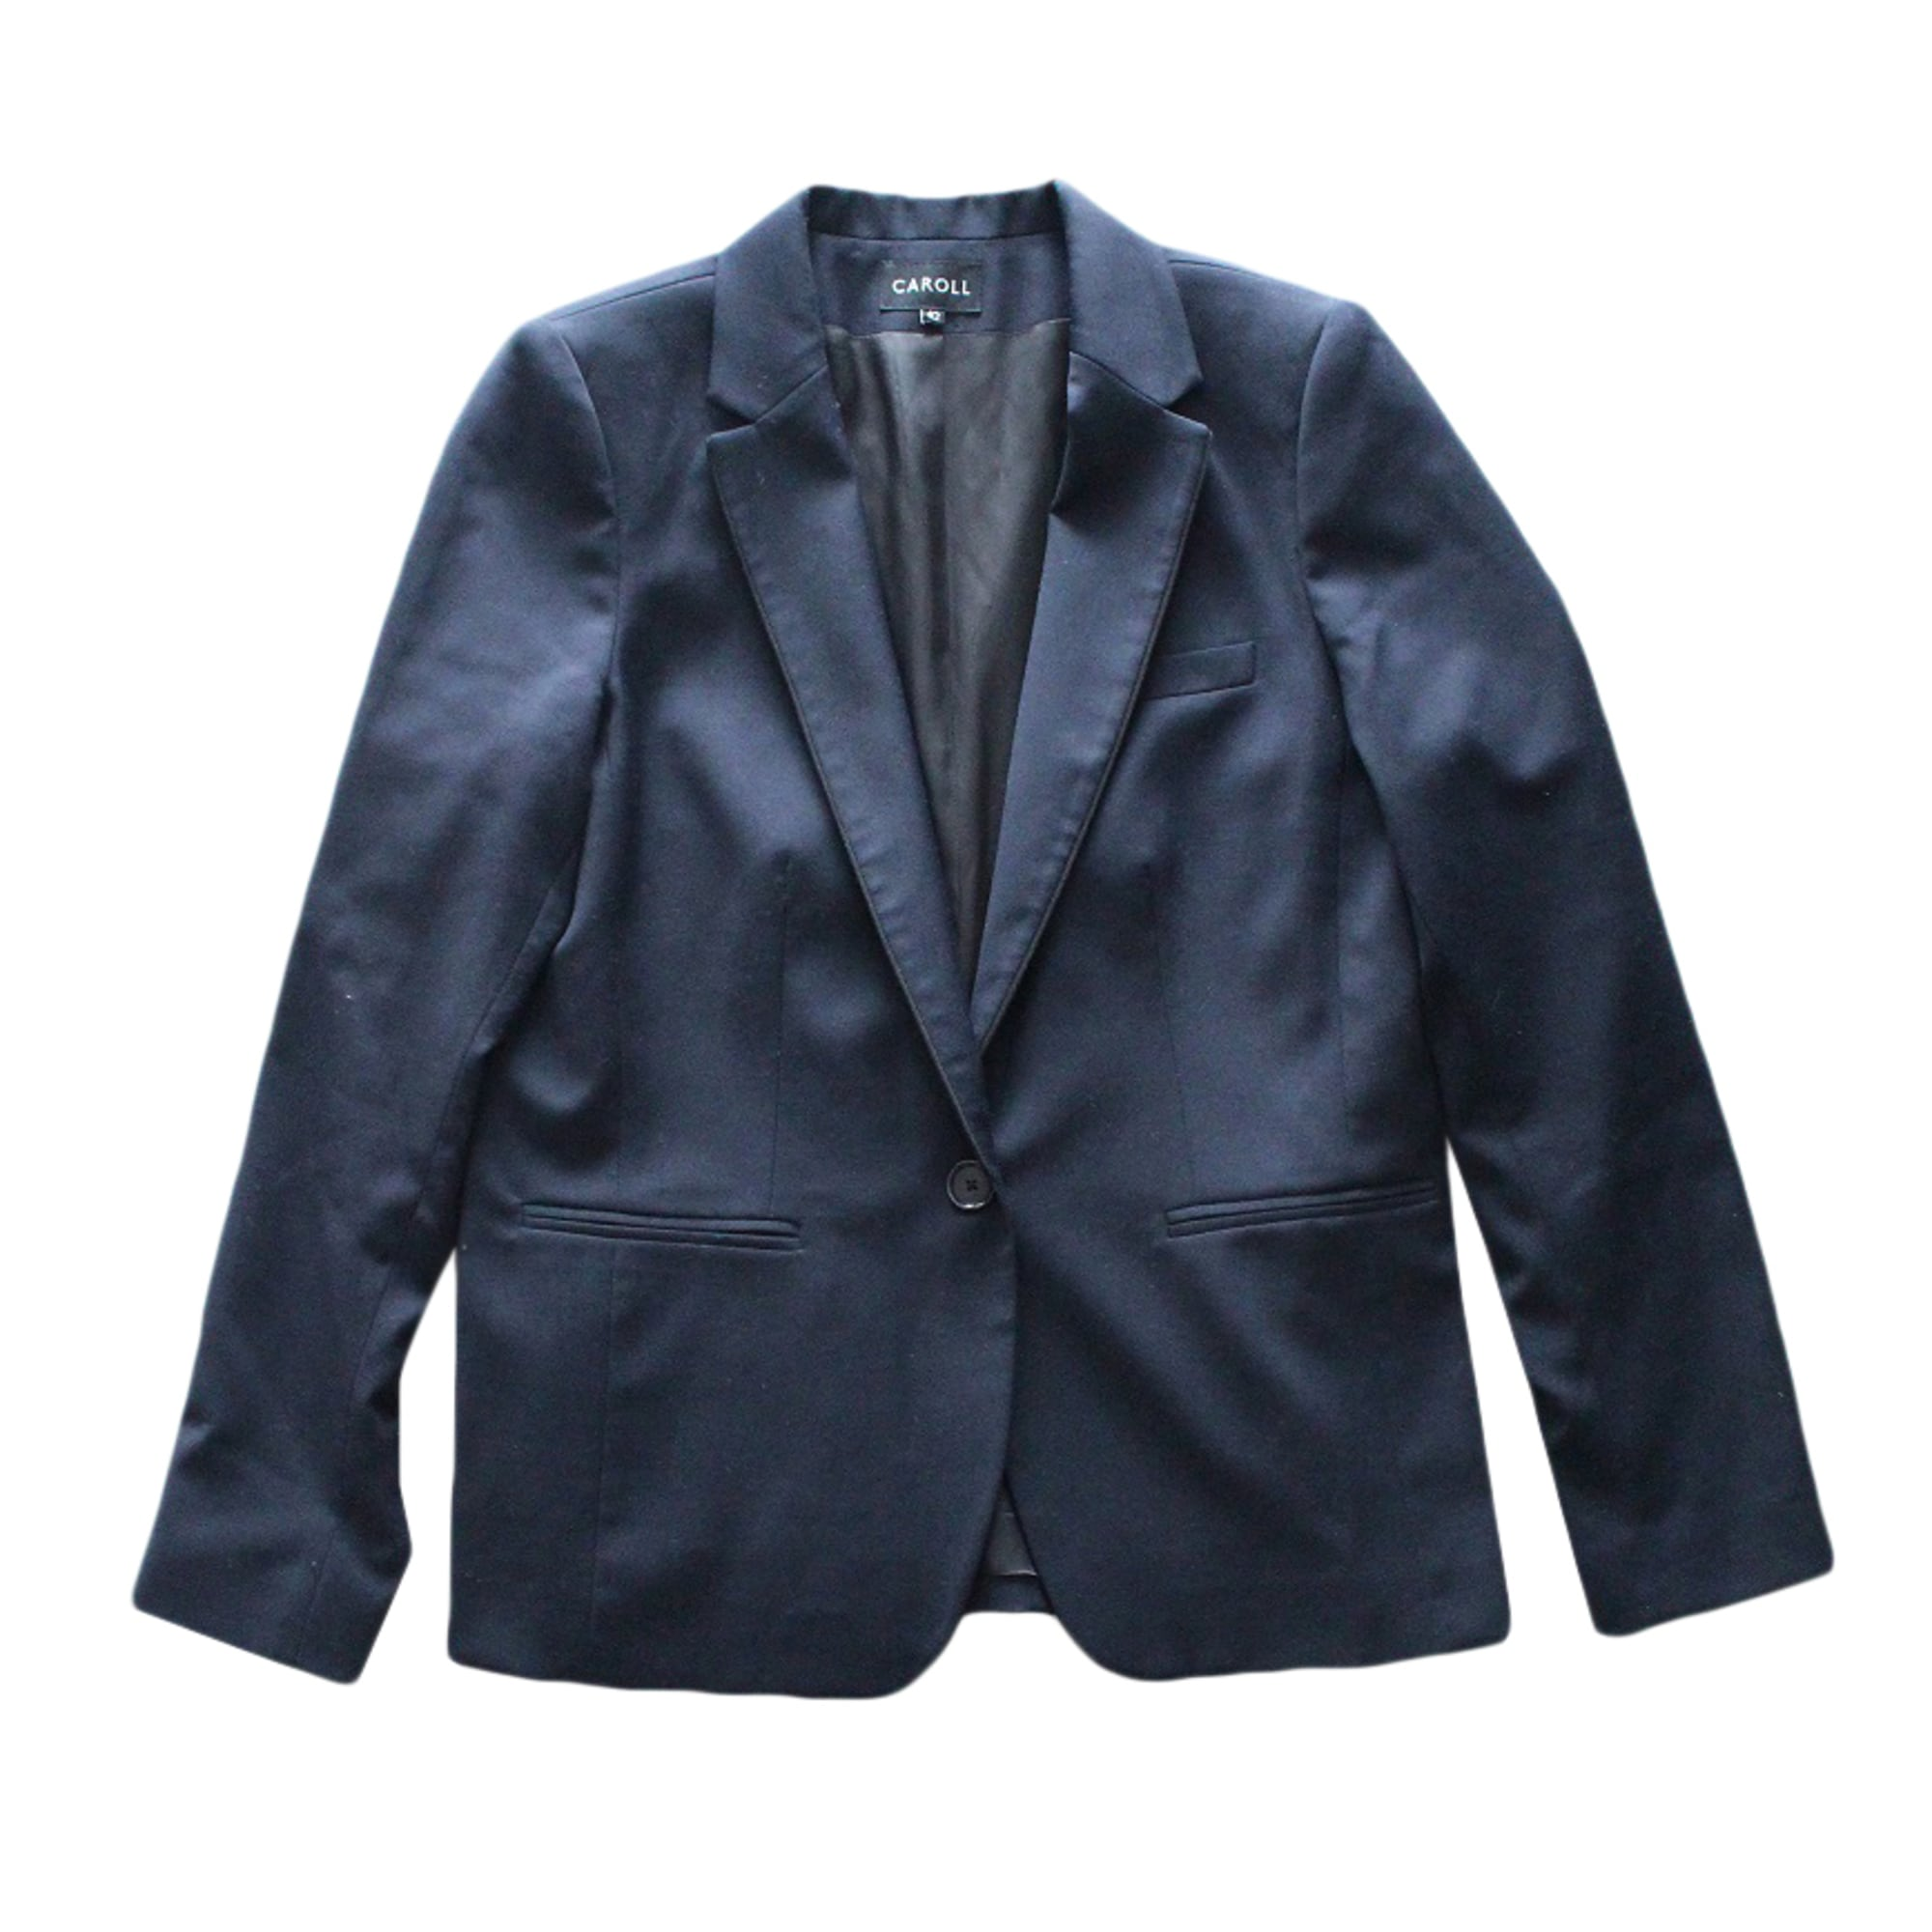 Blazer Bleu lxl Tailleur Veste 3992447 42 Caroll T4 wFxag4wv 7f190a2a893